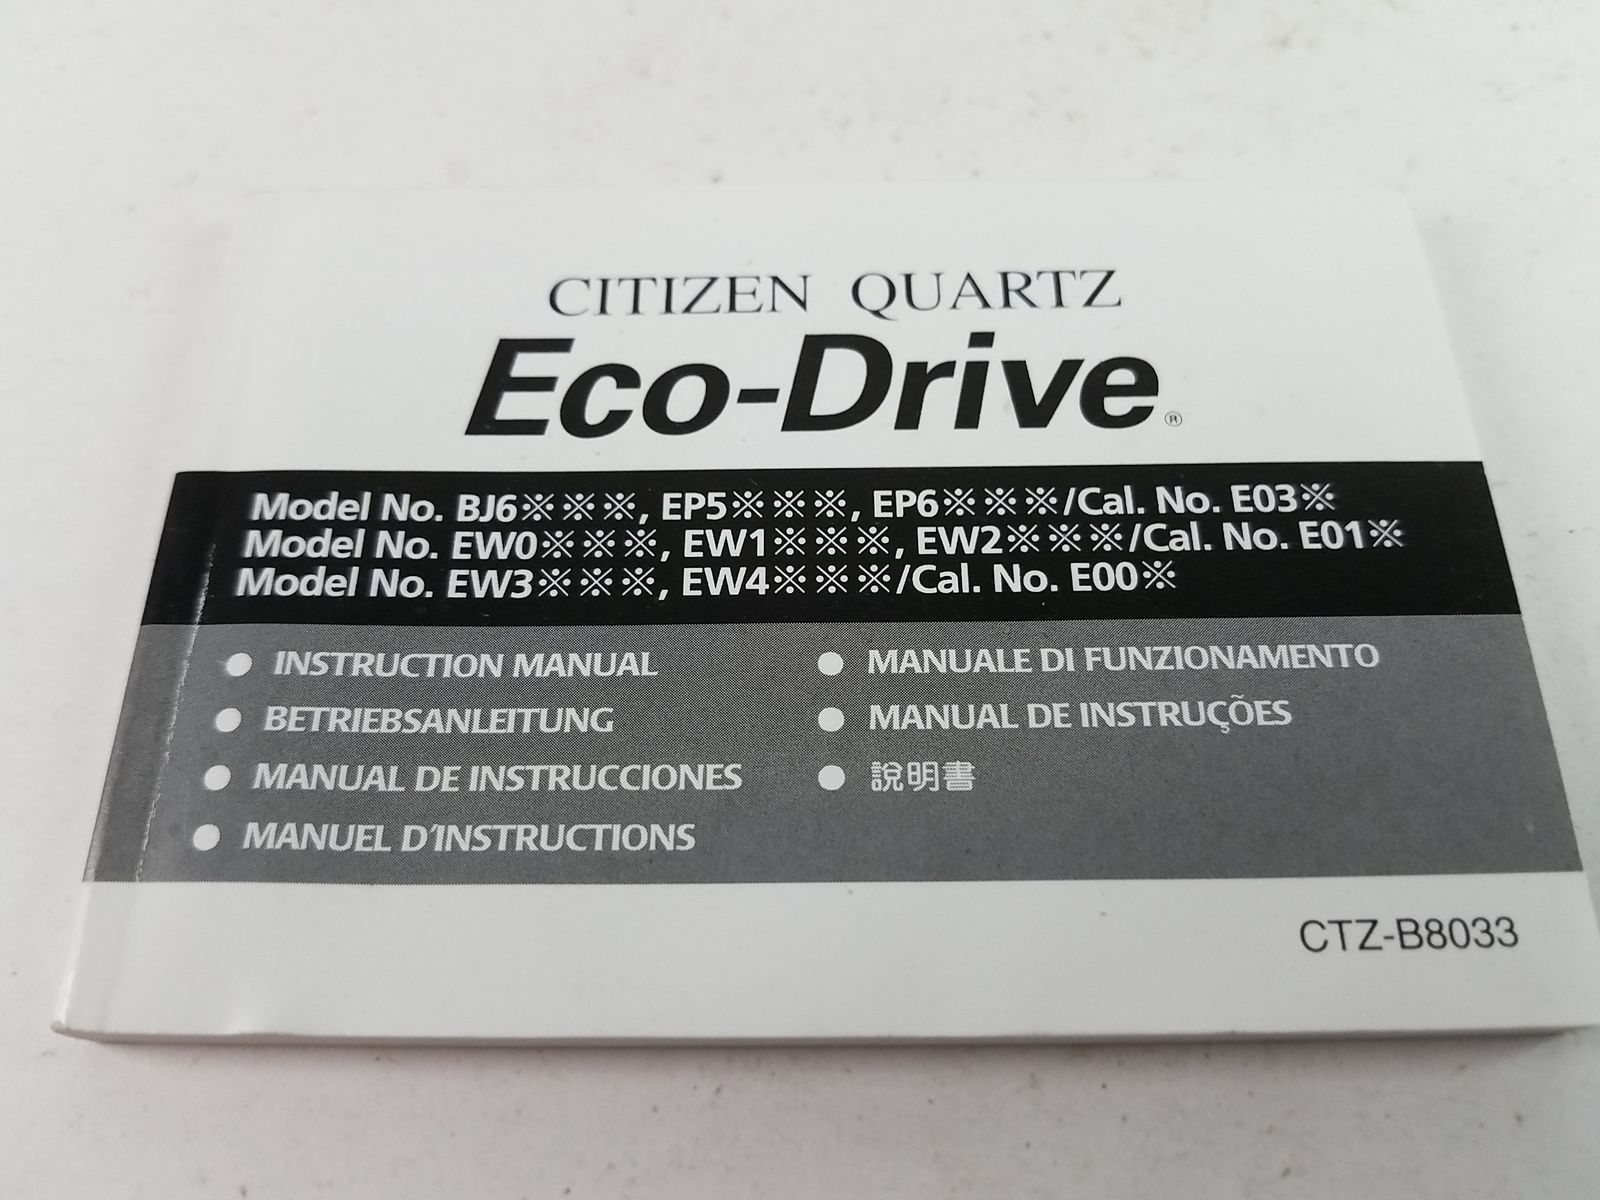 citizen quartz eco drive instruction manual booklet ctz b8033 rh seniorprovide top citizen skyhawk eco drive instruction manual citizen eco drive e820 instruction manual